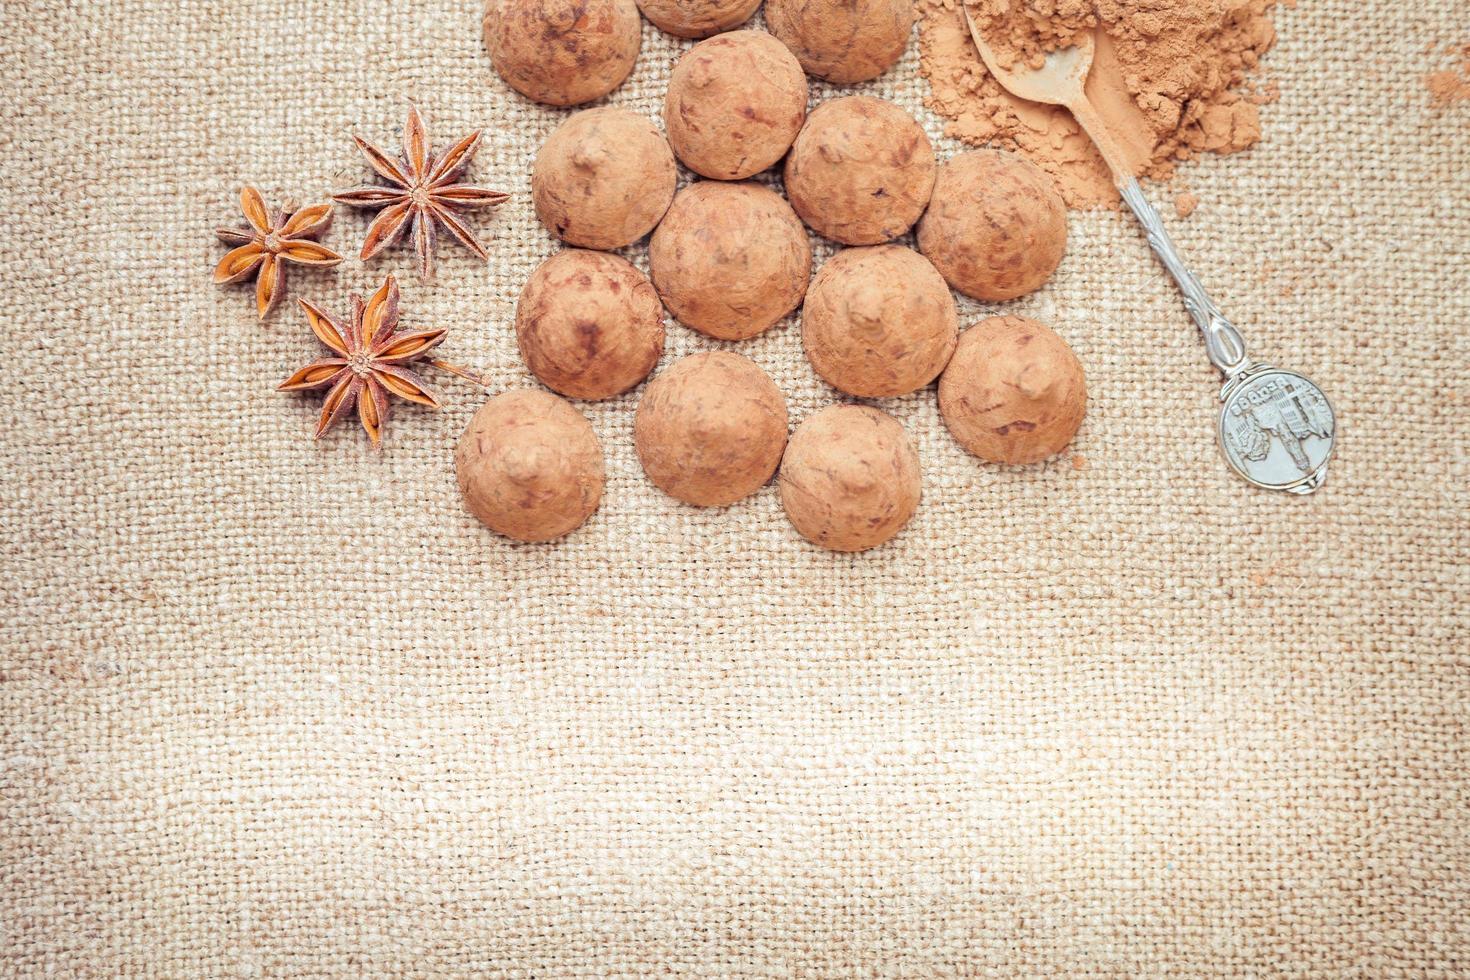 Trufas de chocolate dulces sobre un fondo de textura de bolsa de arpillera foto